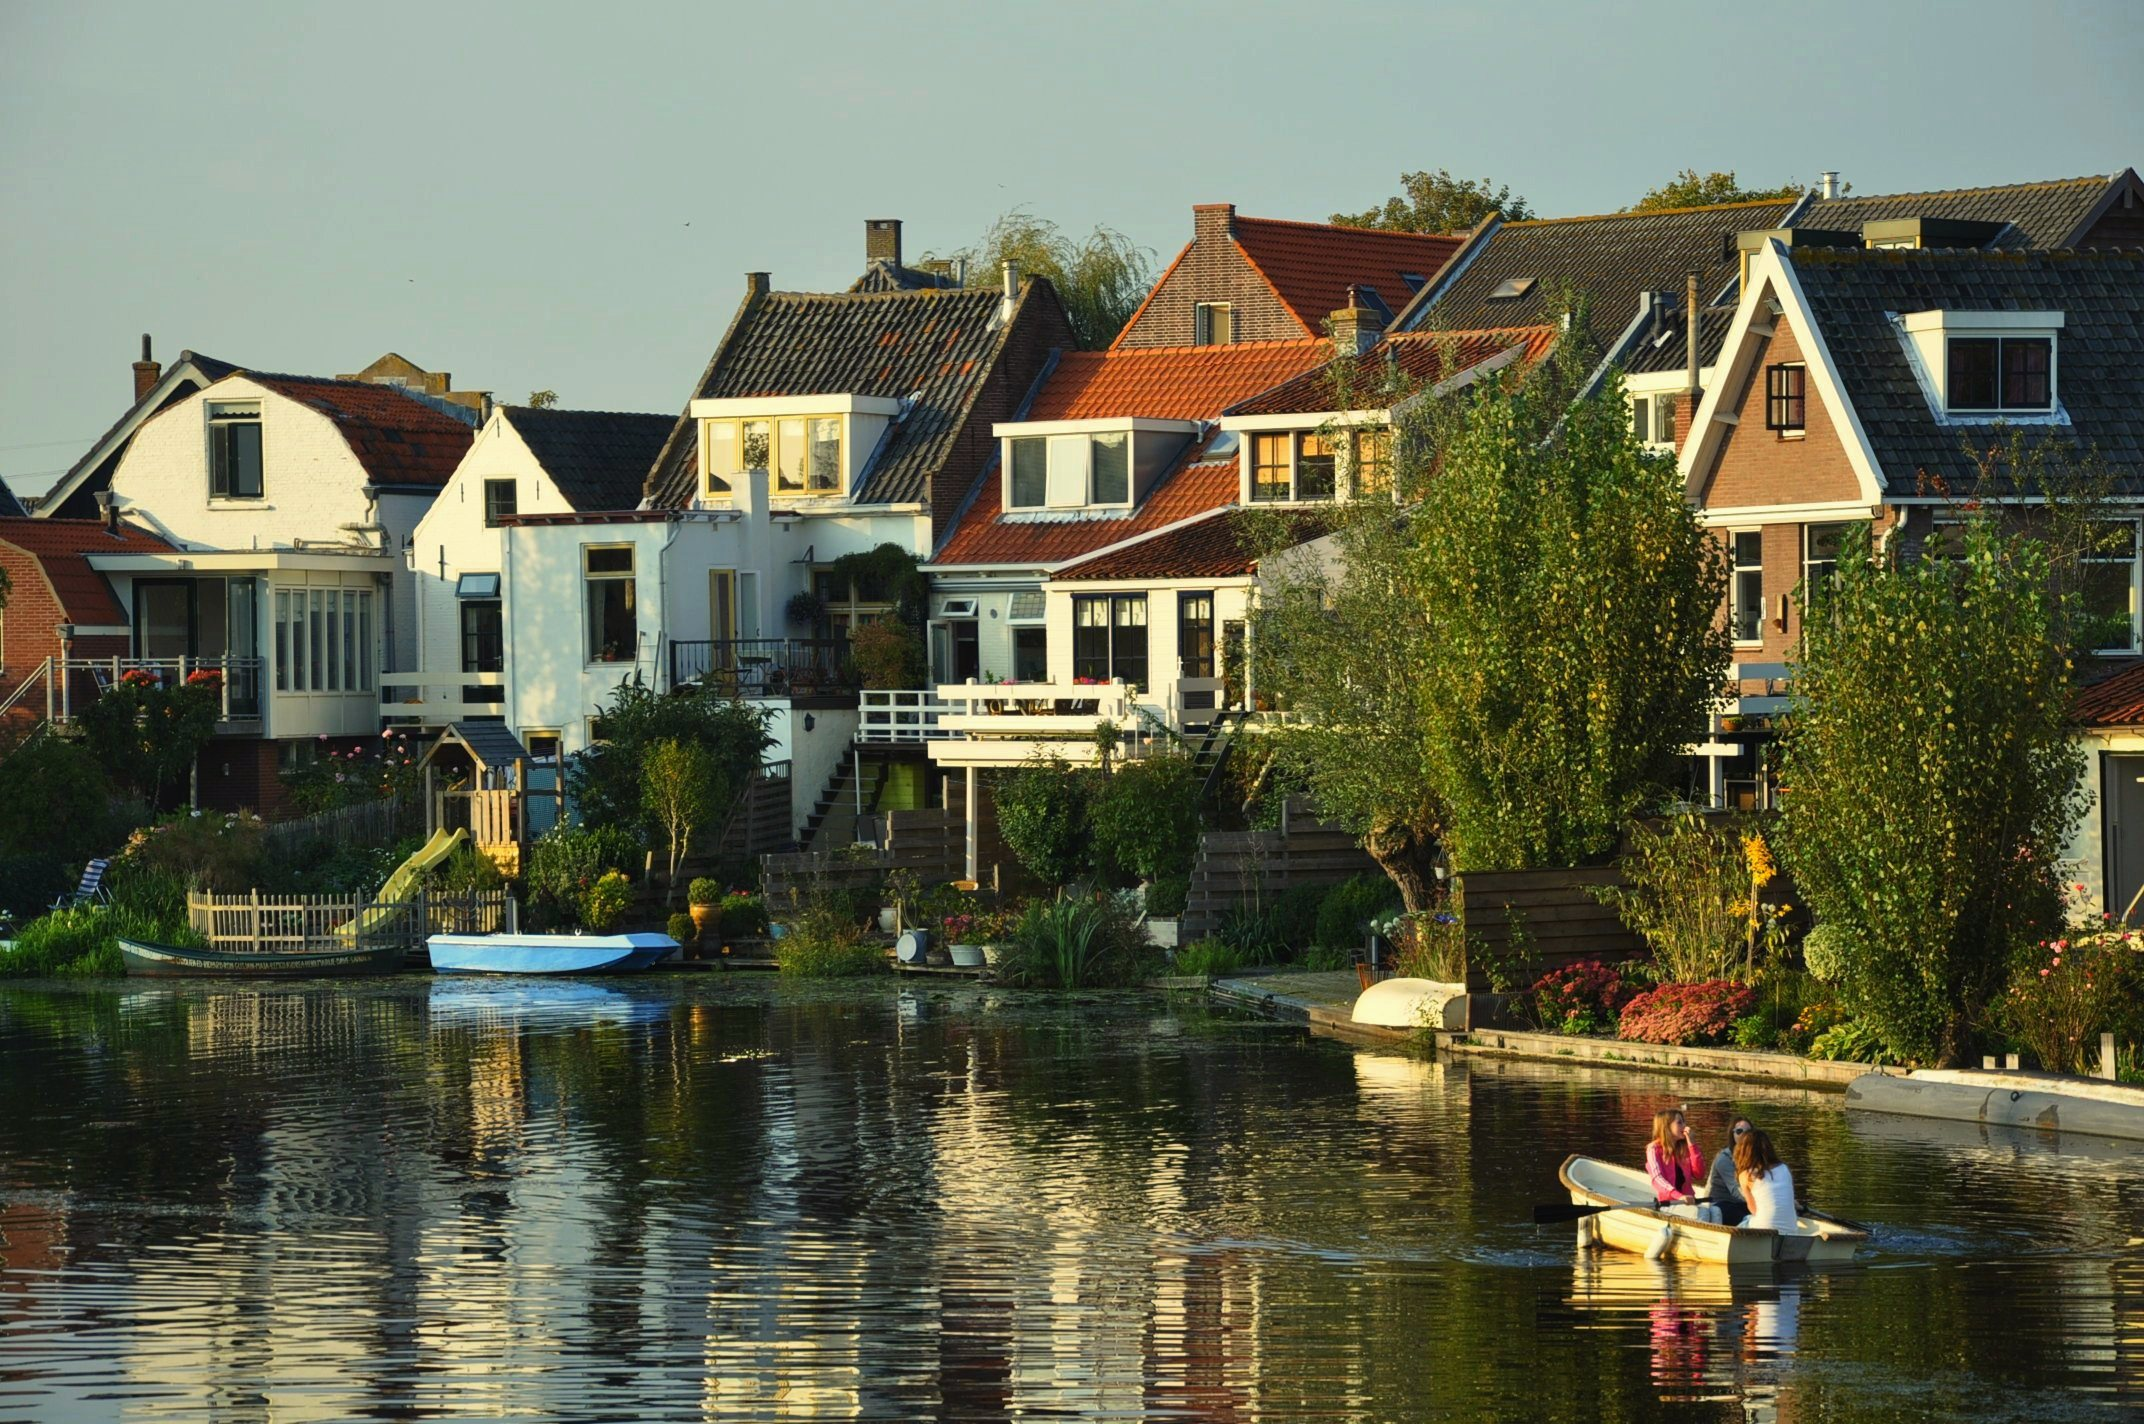 File:Netherlands, Haastrecht (1).JPG - Wikimedia Commons